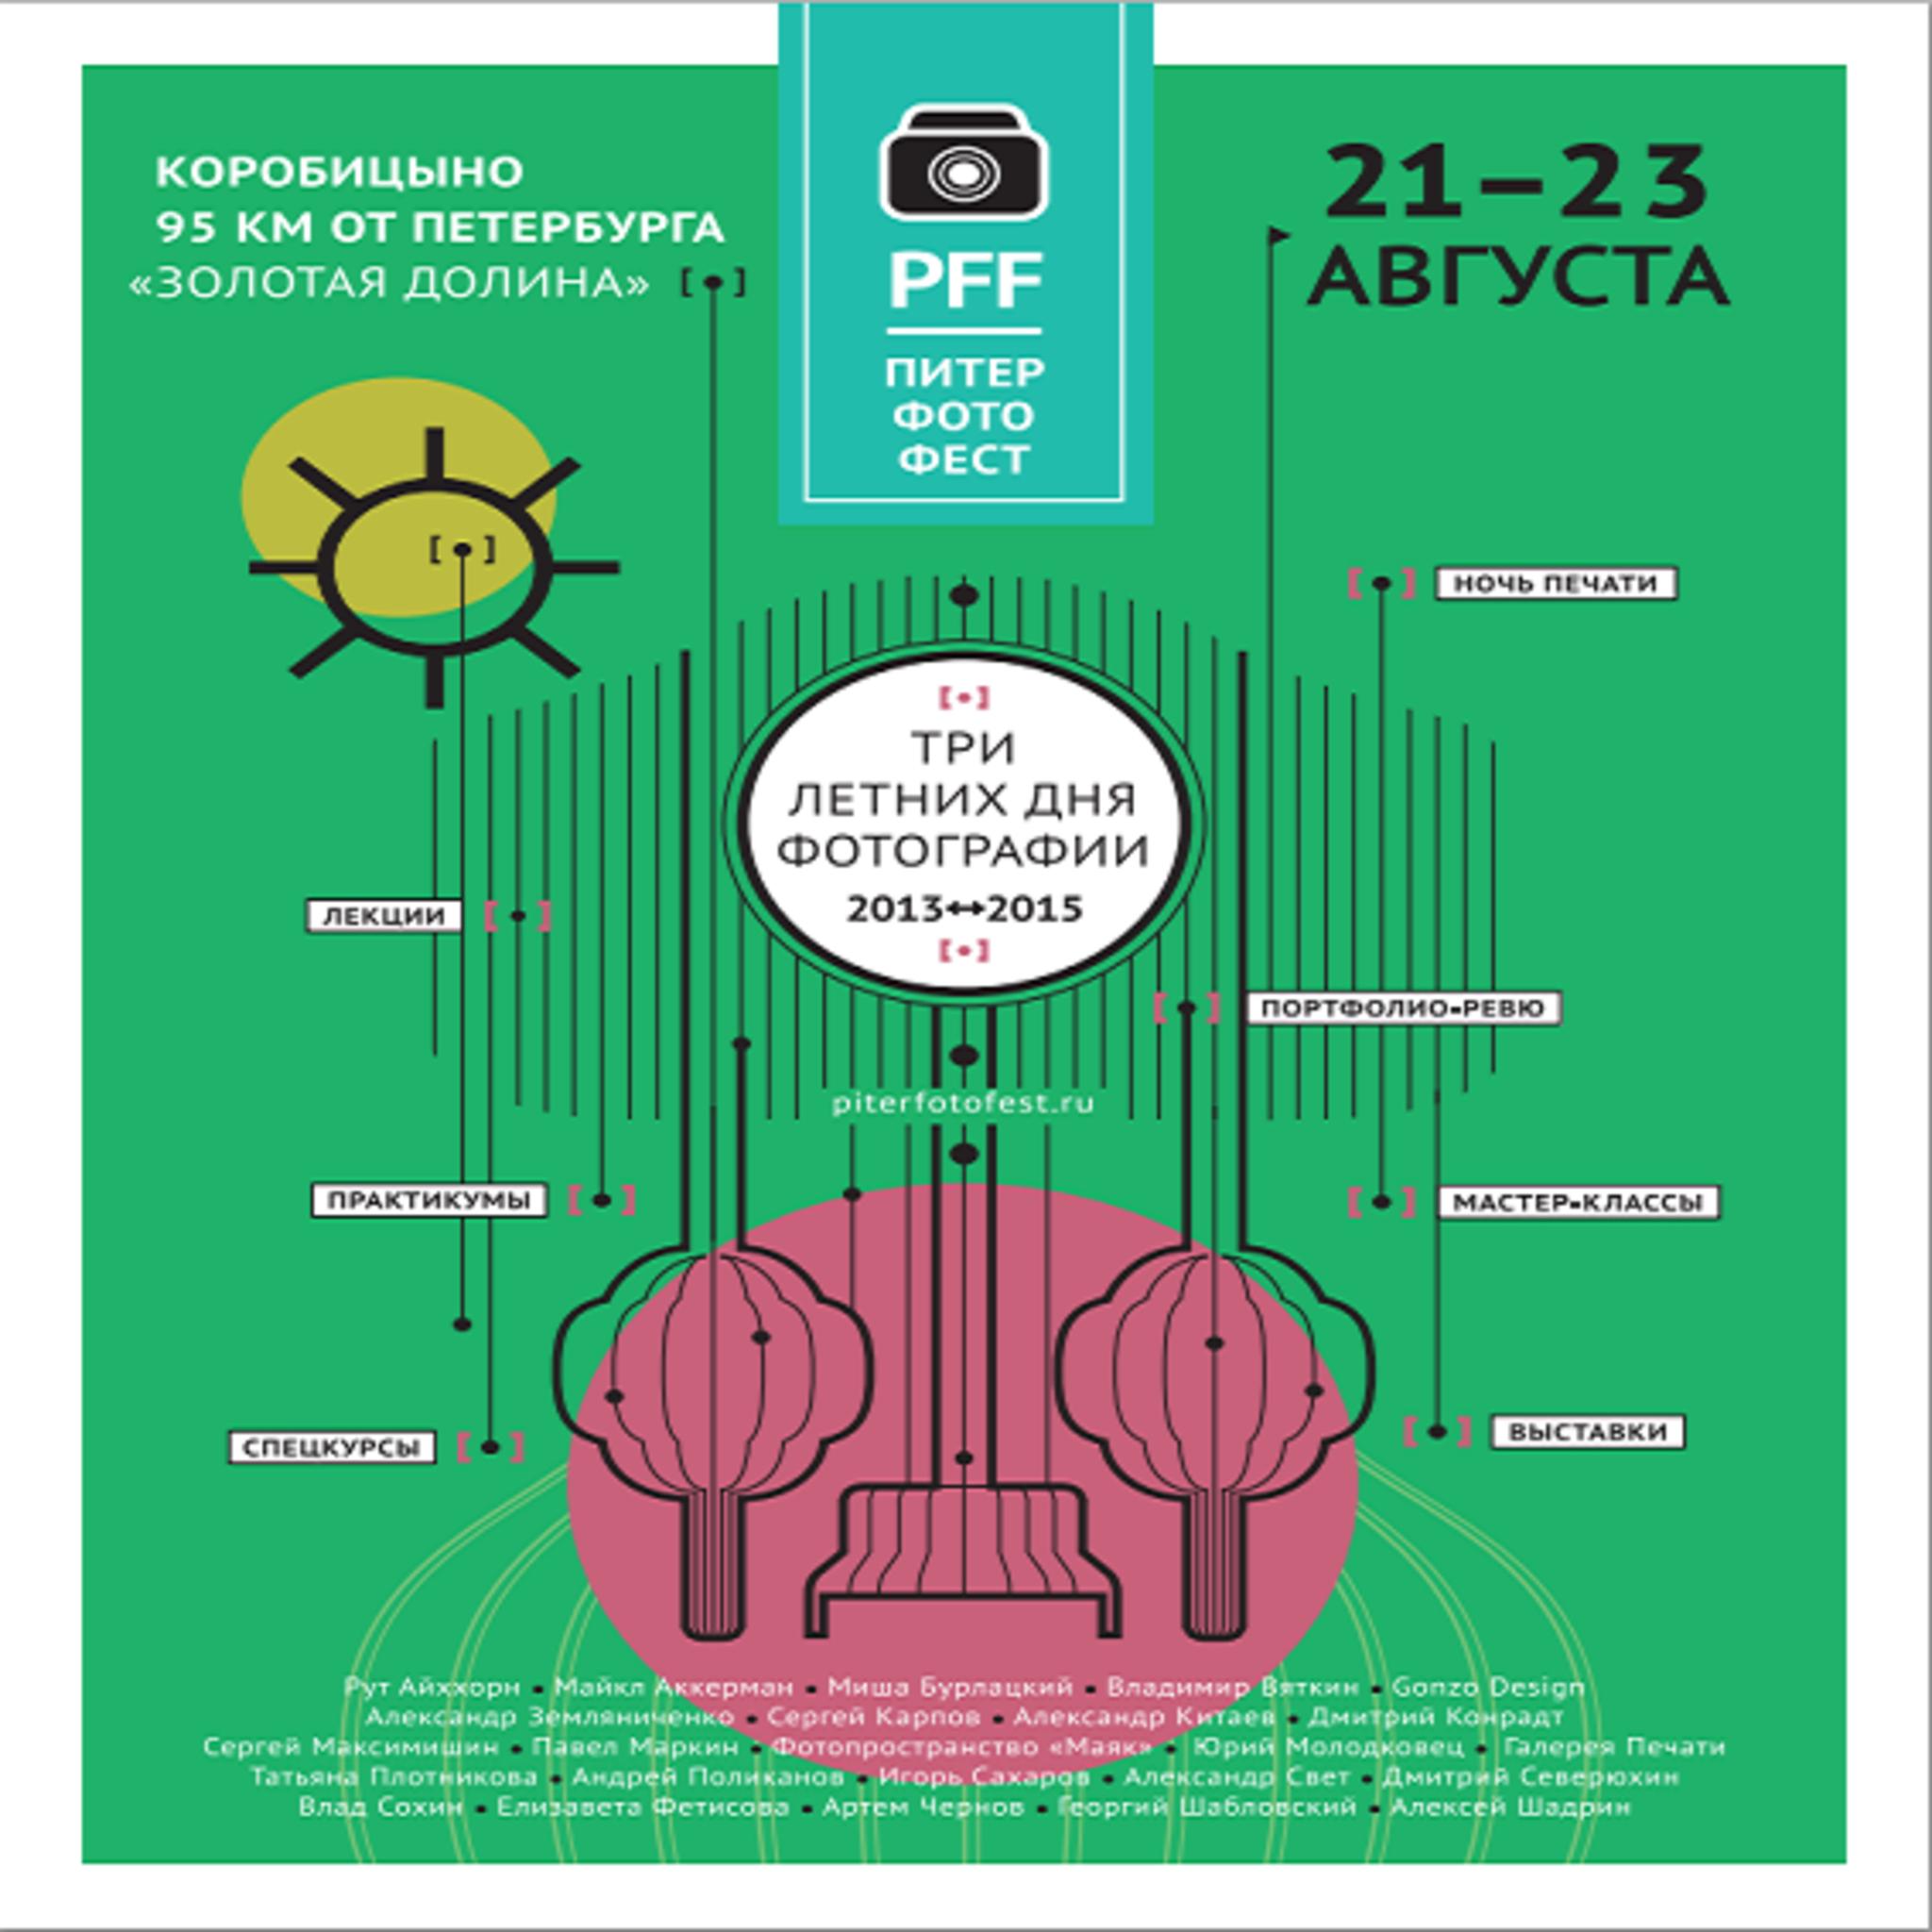 III Festival Piterfoto-Fest-2015